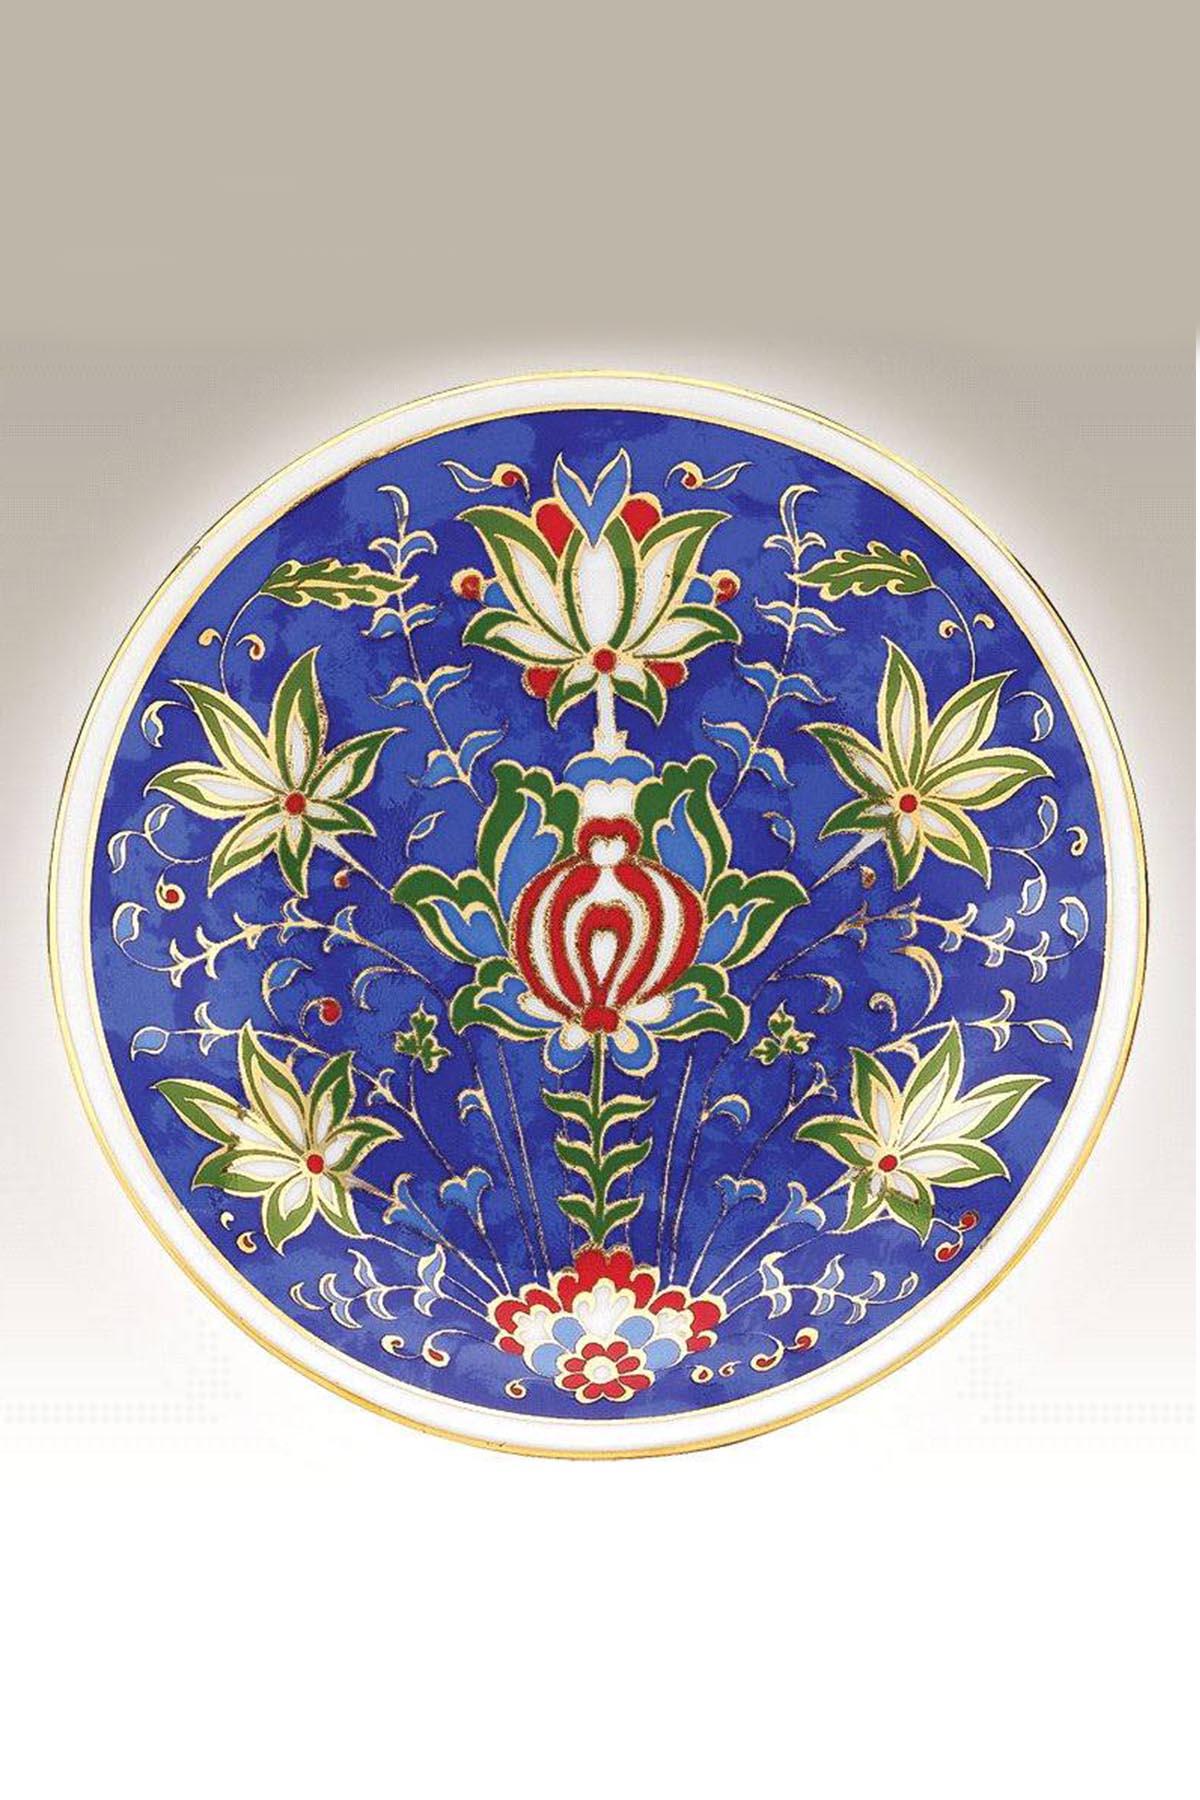 Kütahya Porselen - Kütahya Porselen El Yapımı 13cm Tabak No 13